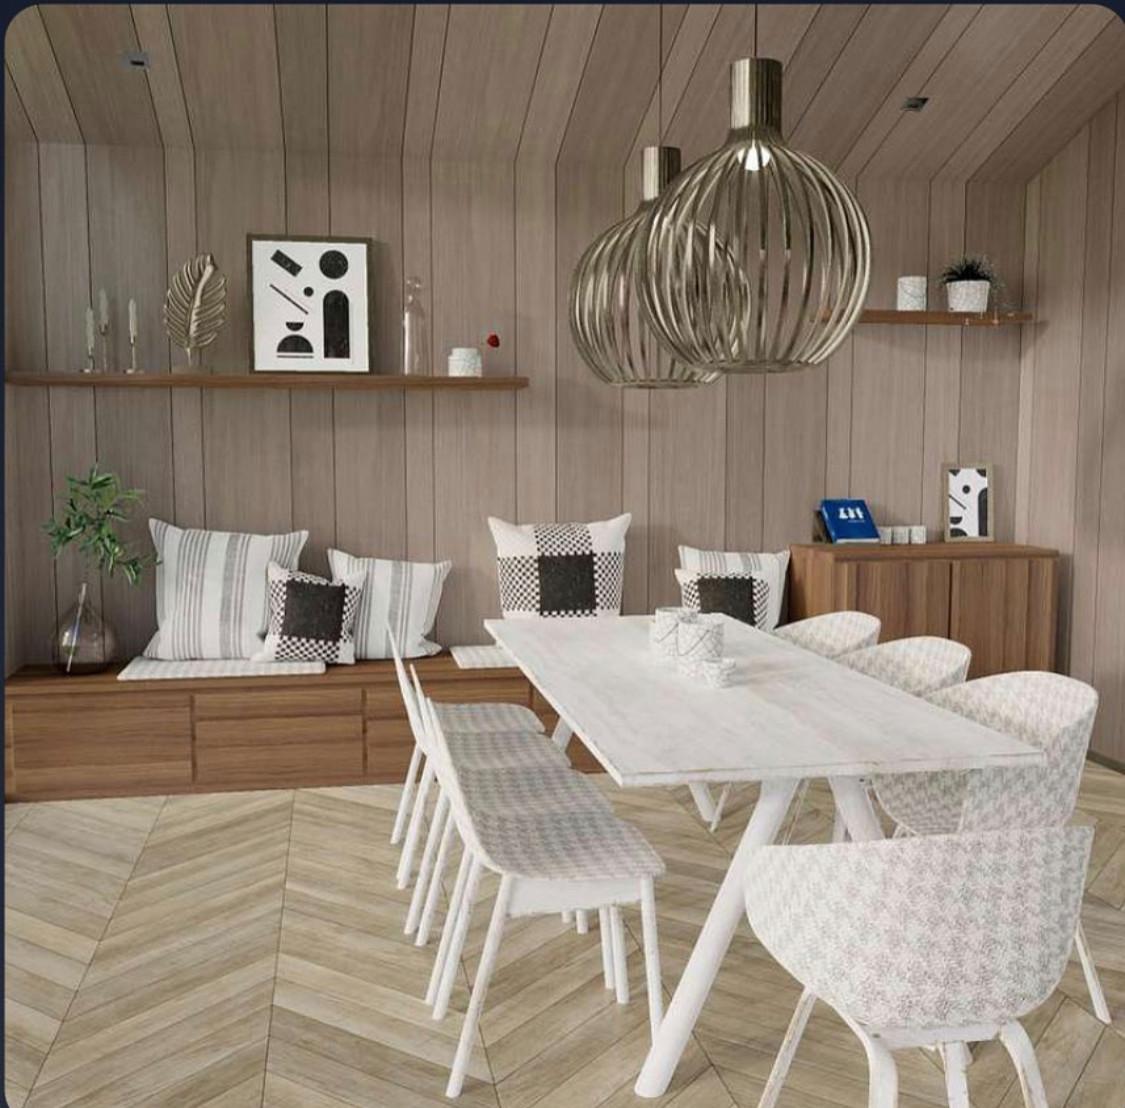 Dining room in Orlando